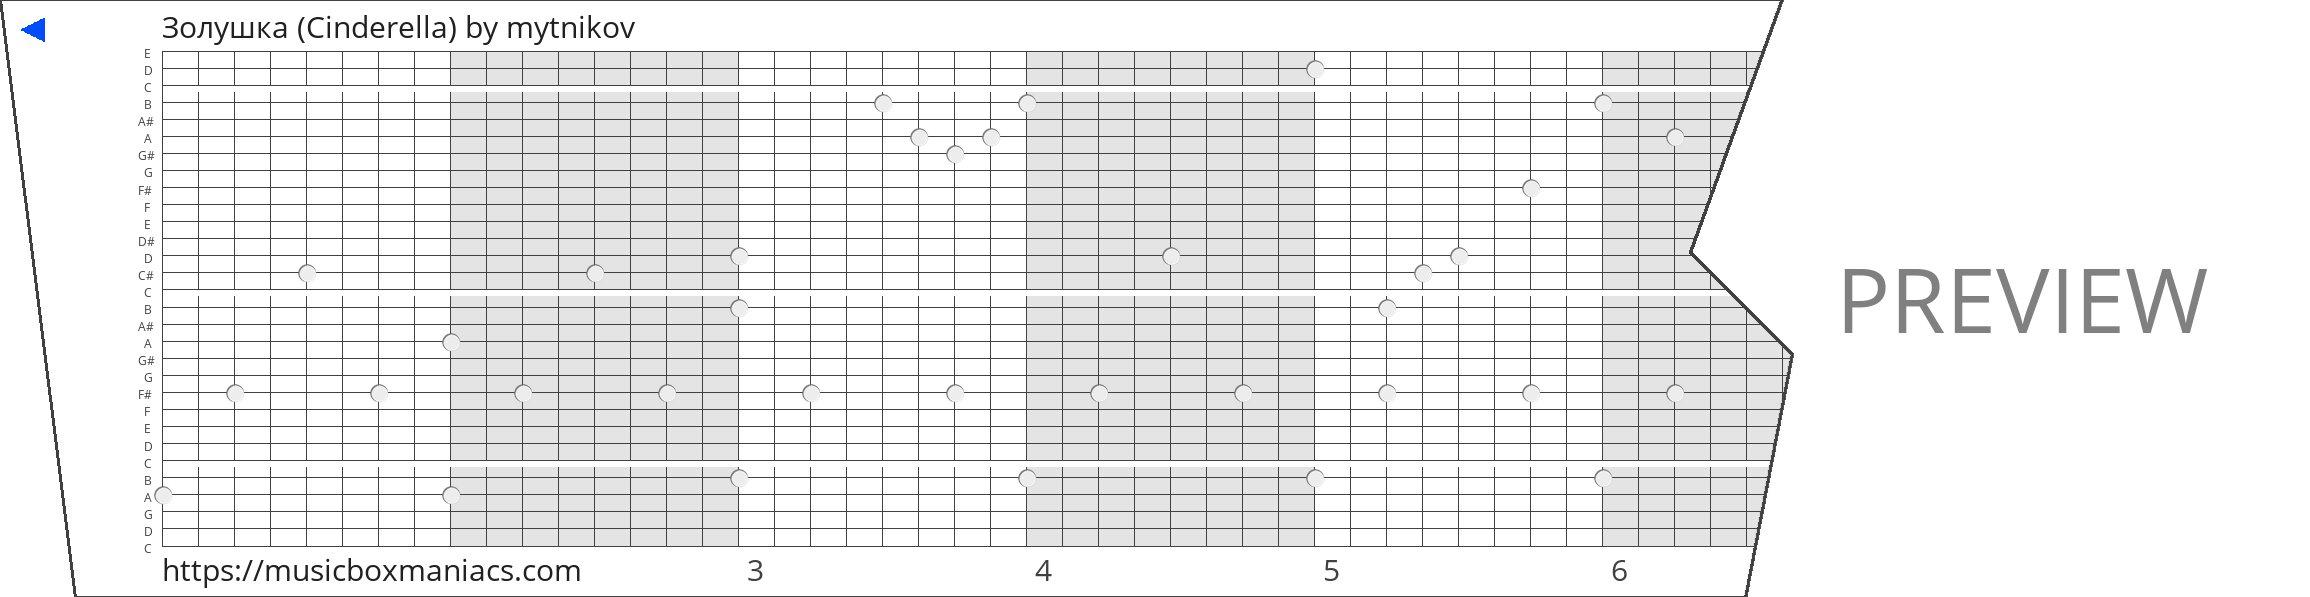 Золушка (Cinderella) 30 note music box paper strip